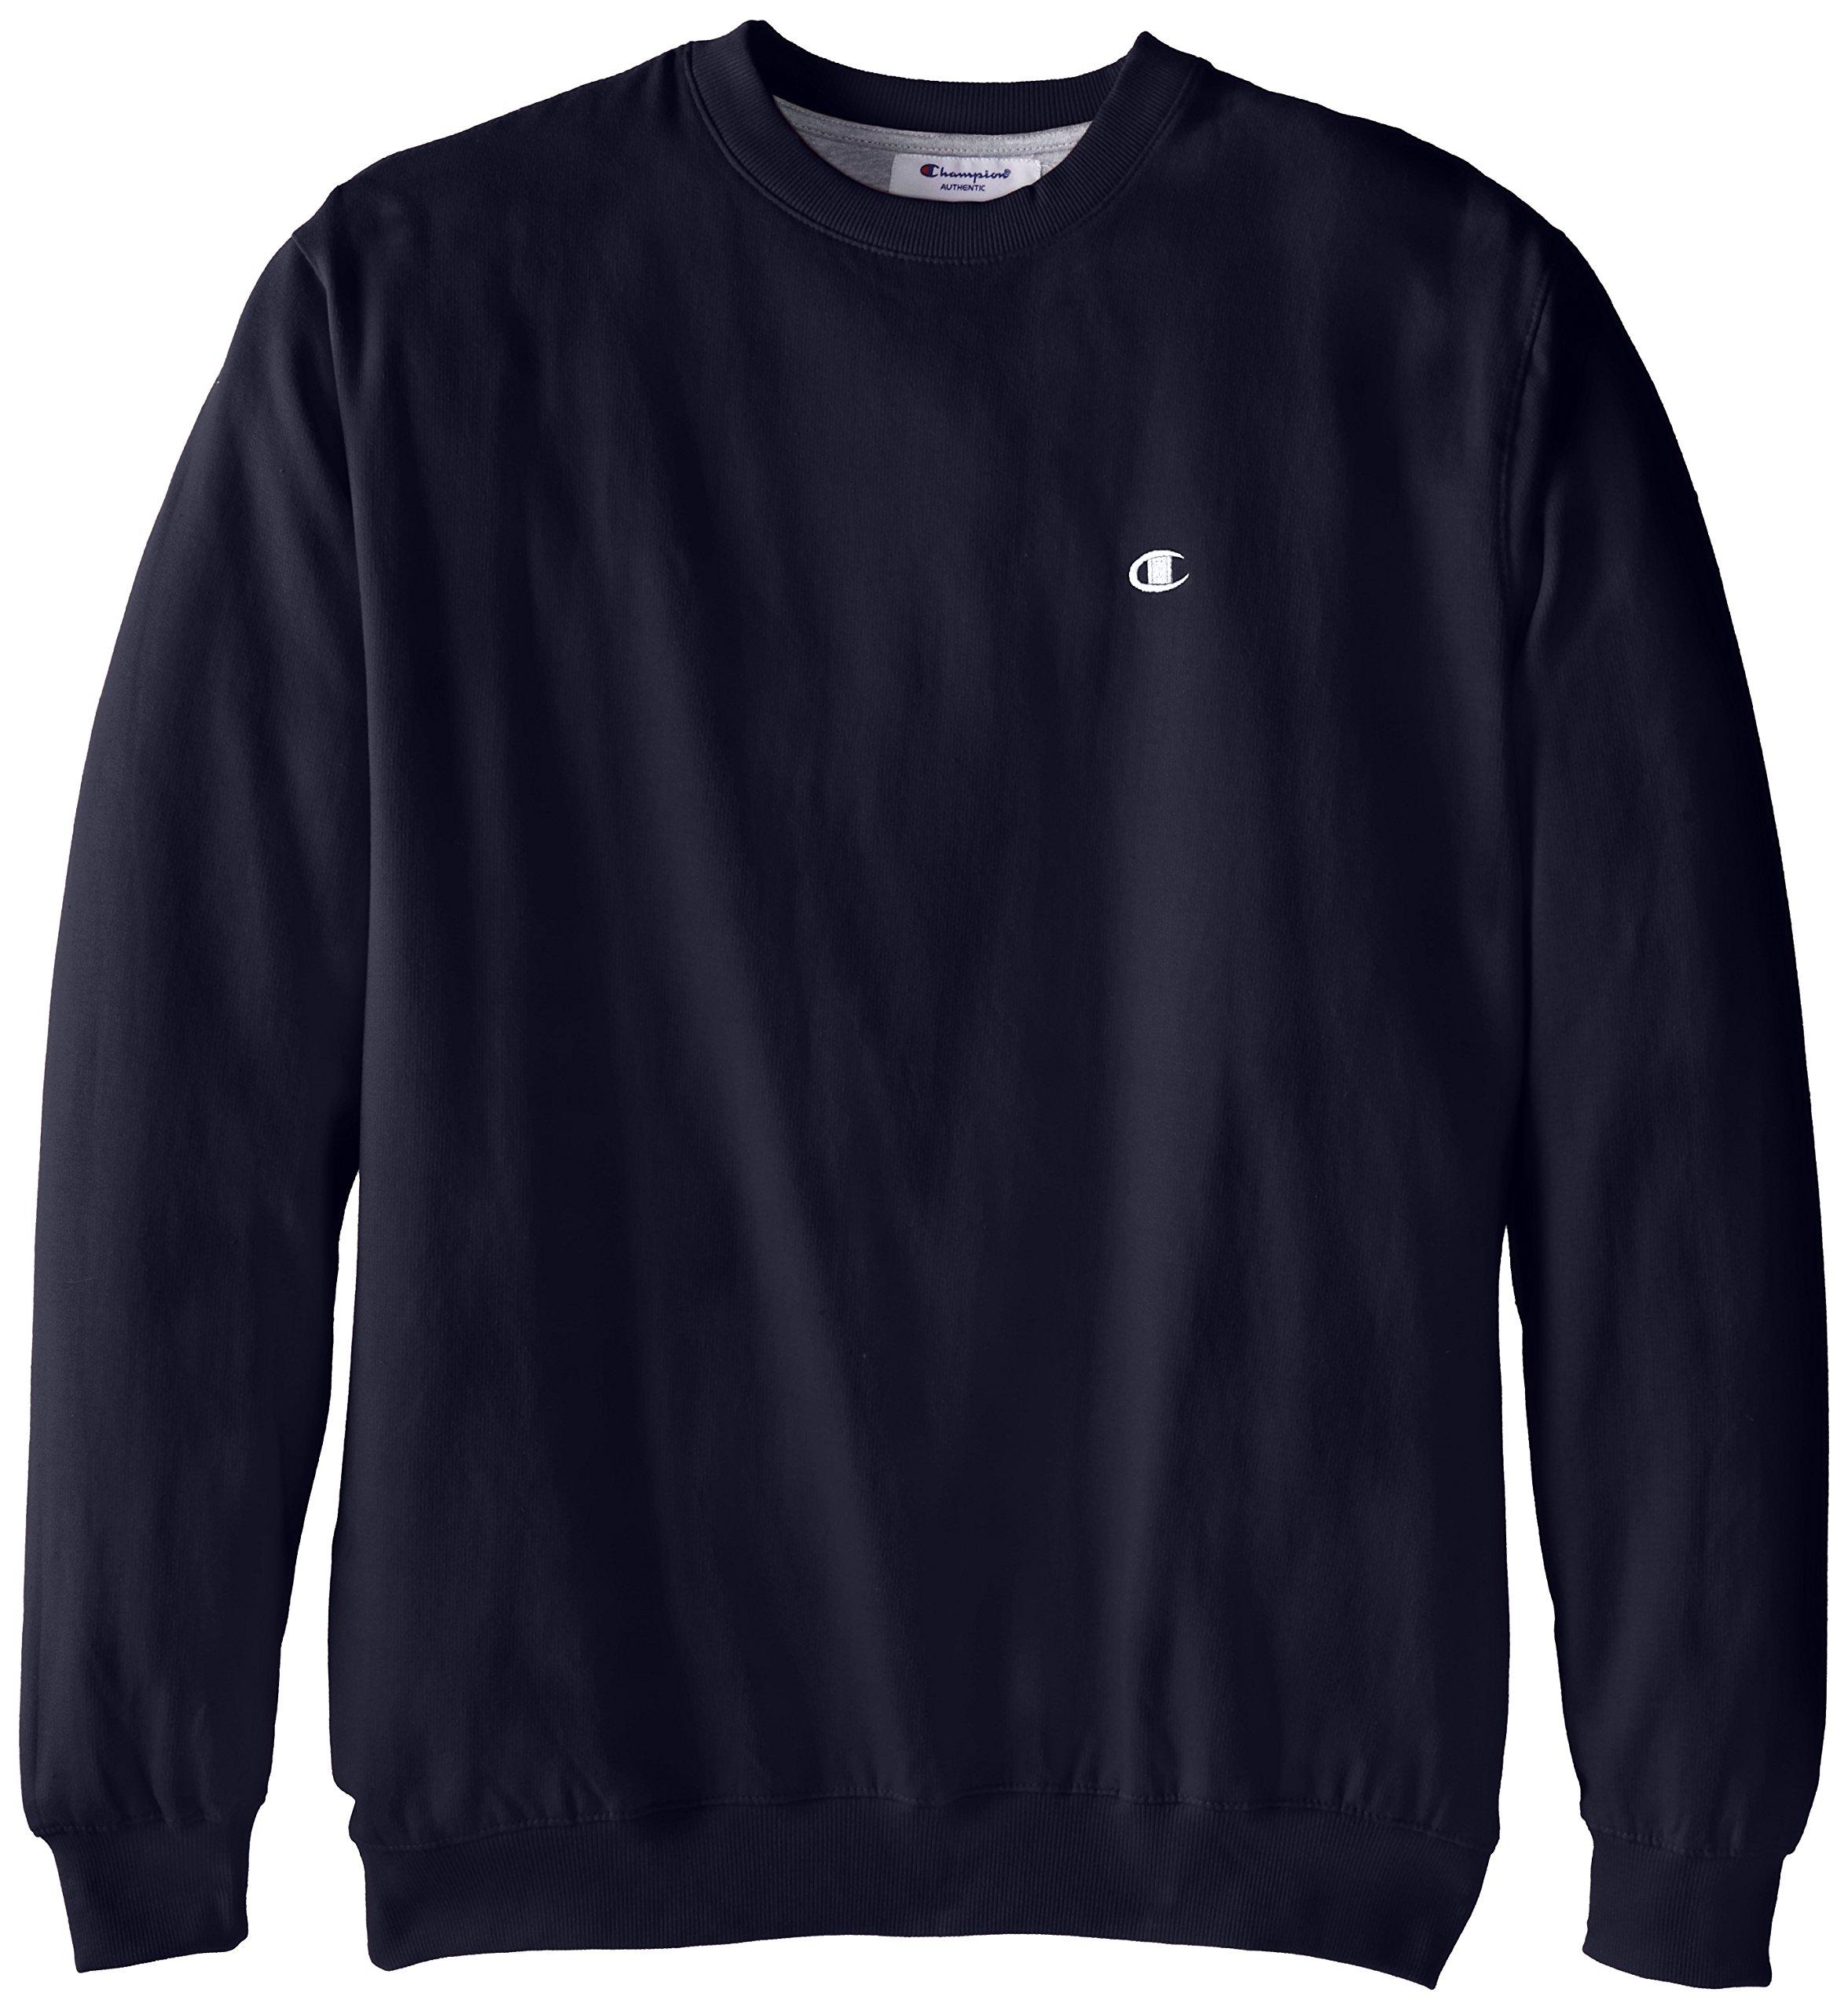 Champion Men's Big-Tall Fleece Crew Sweatshirt, Navy, 3X/Tall by Champion